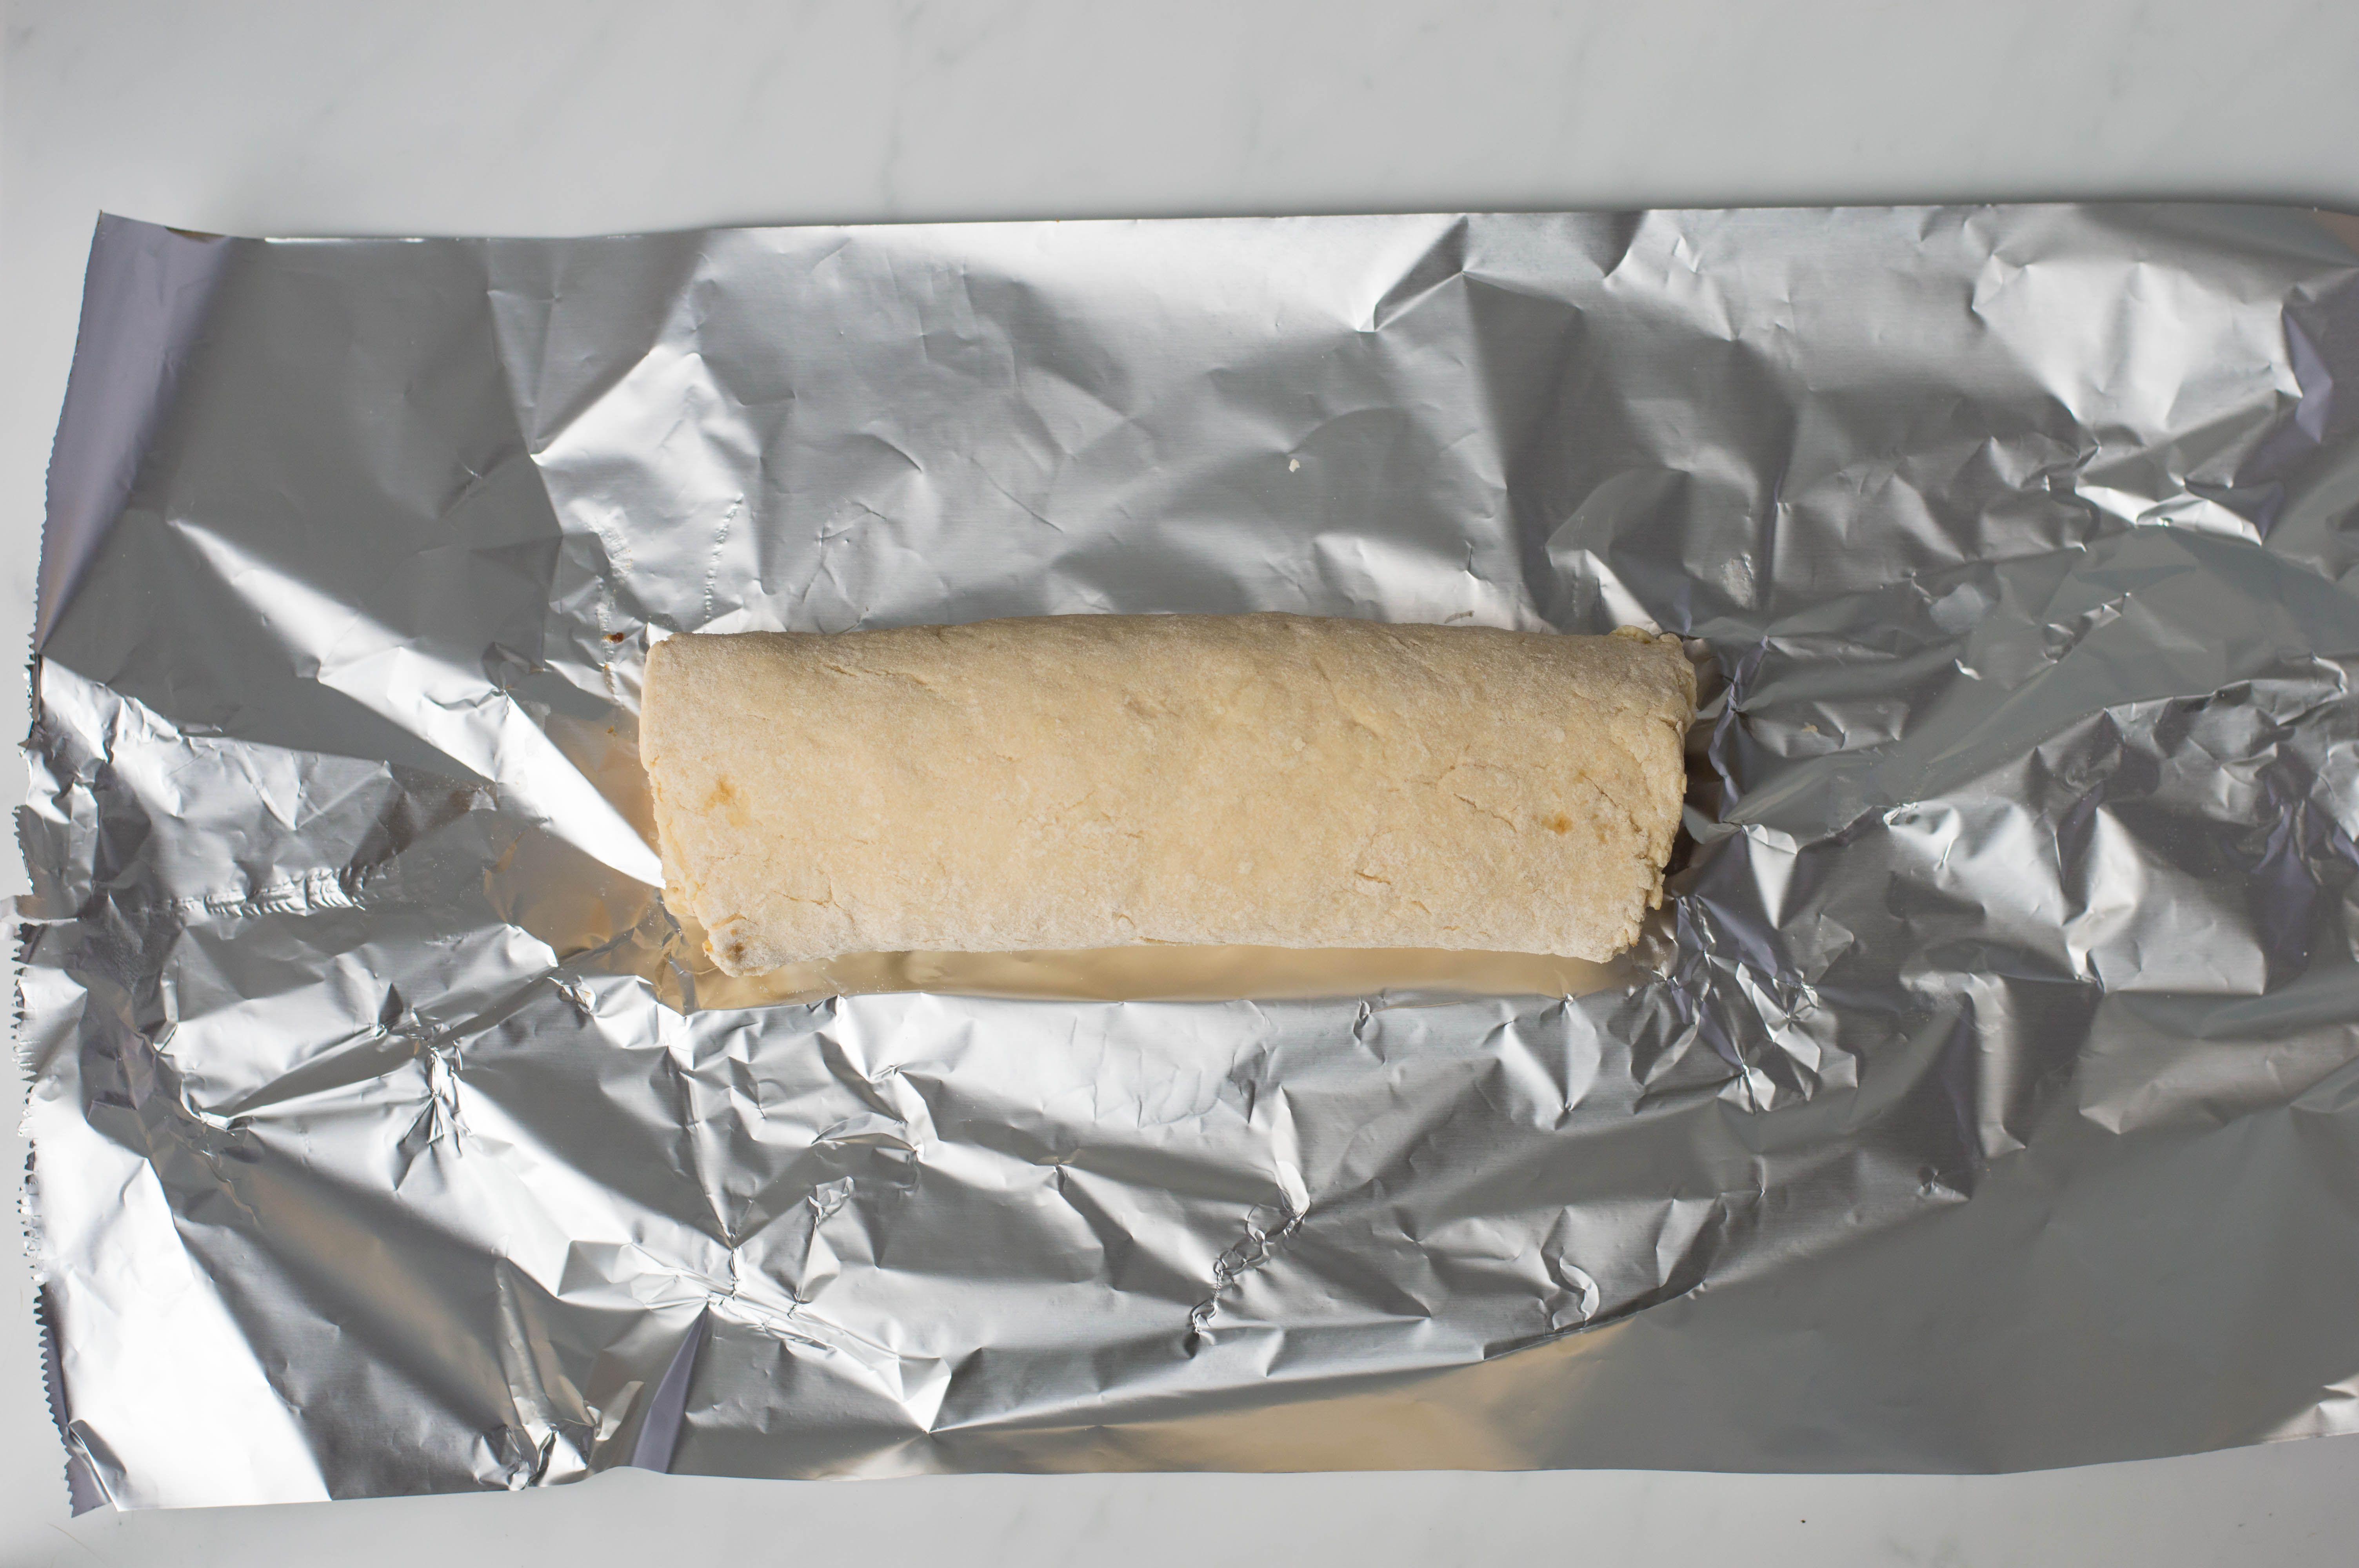 Dough roll on foil